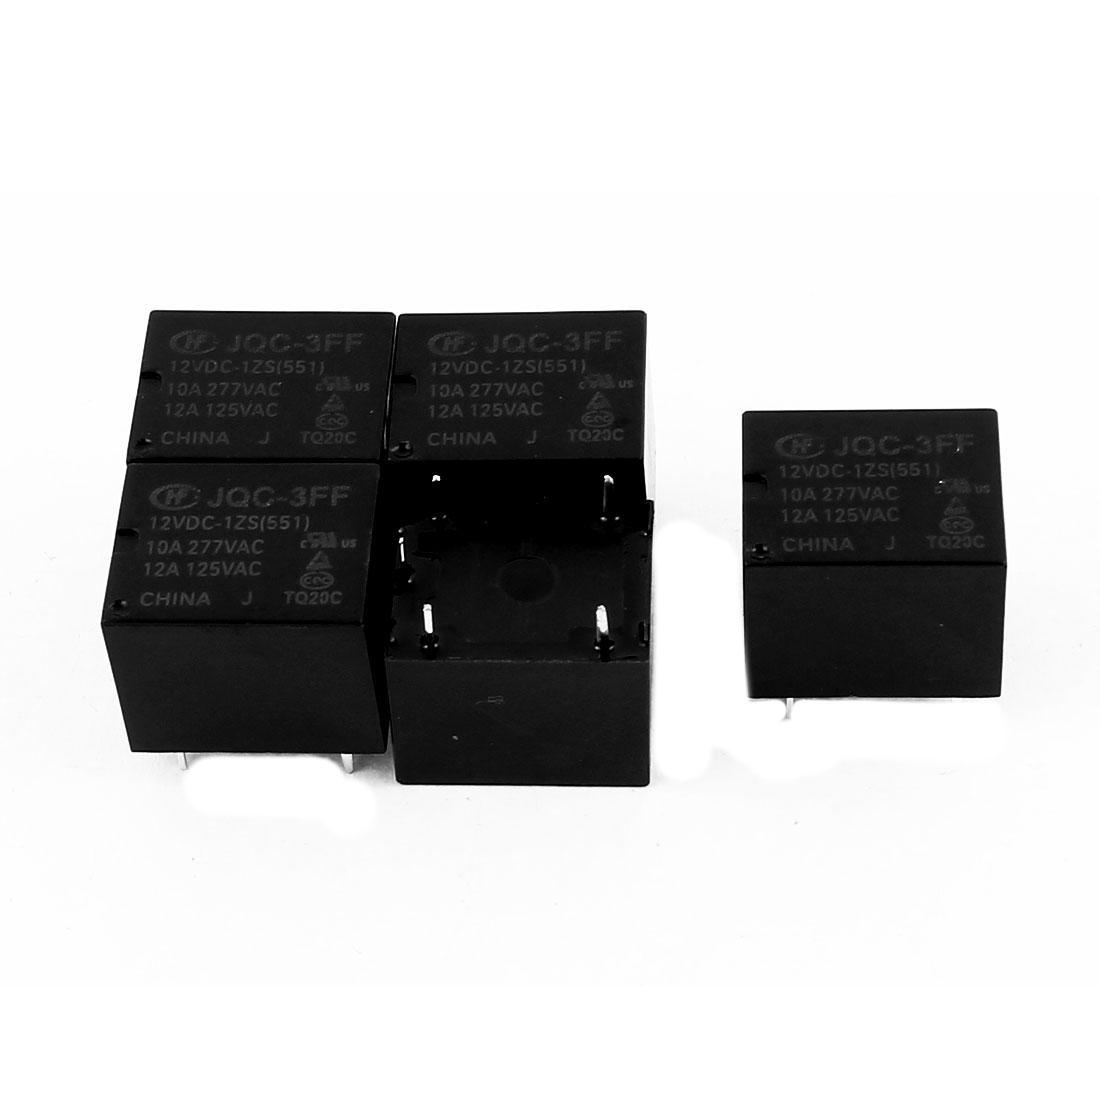 5 Pcs 12VDC 277VAC 10A 5 Pole SPDT Conversion JQC-3FF/012-1ZS(511) Power Relay